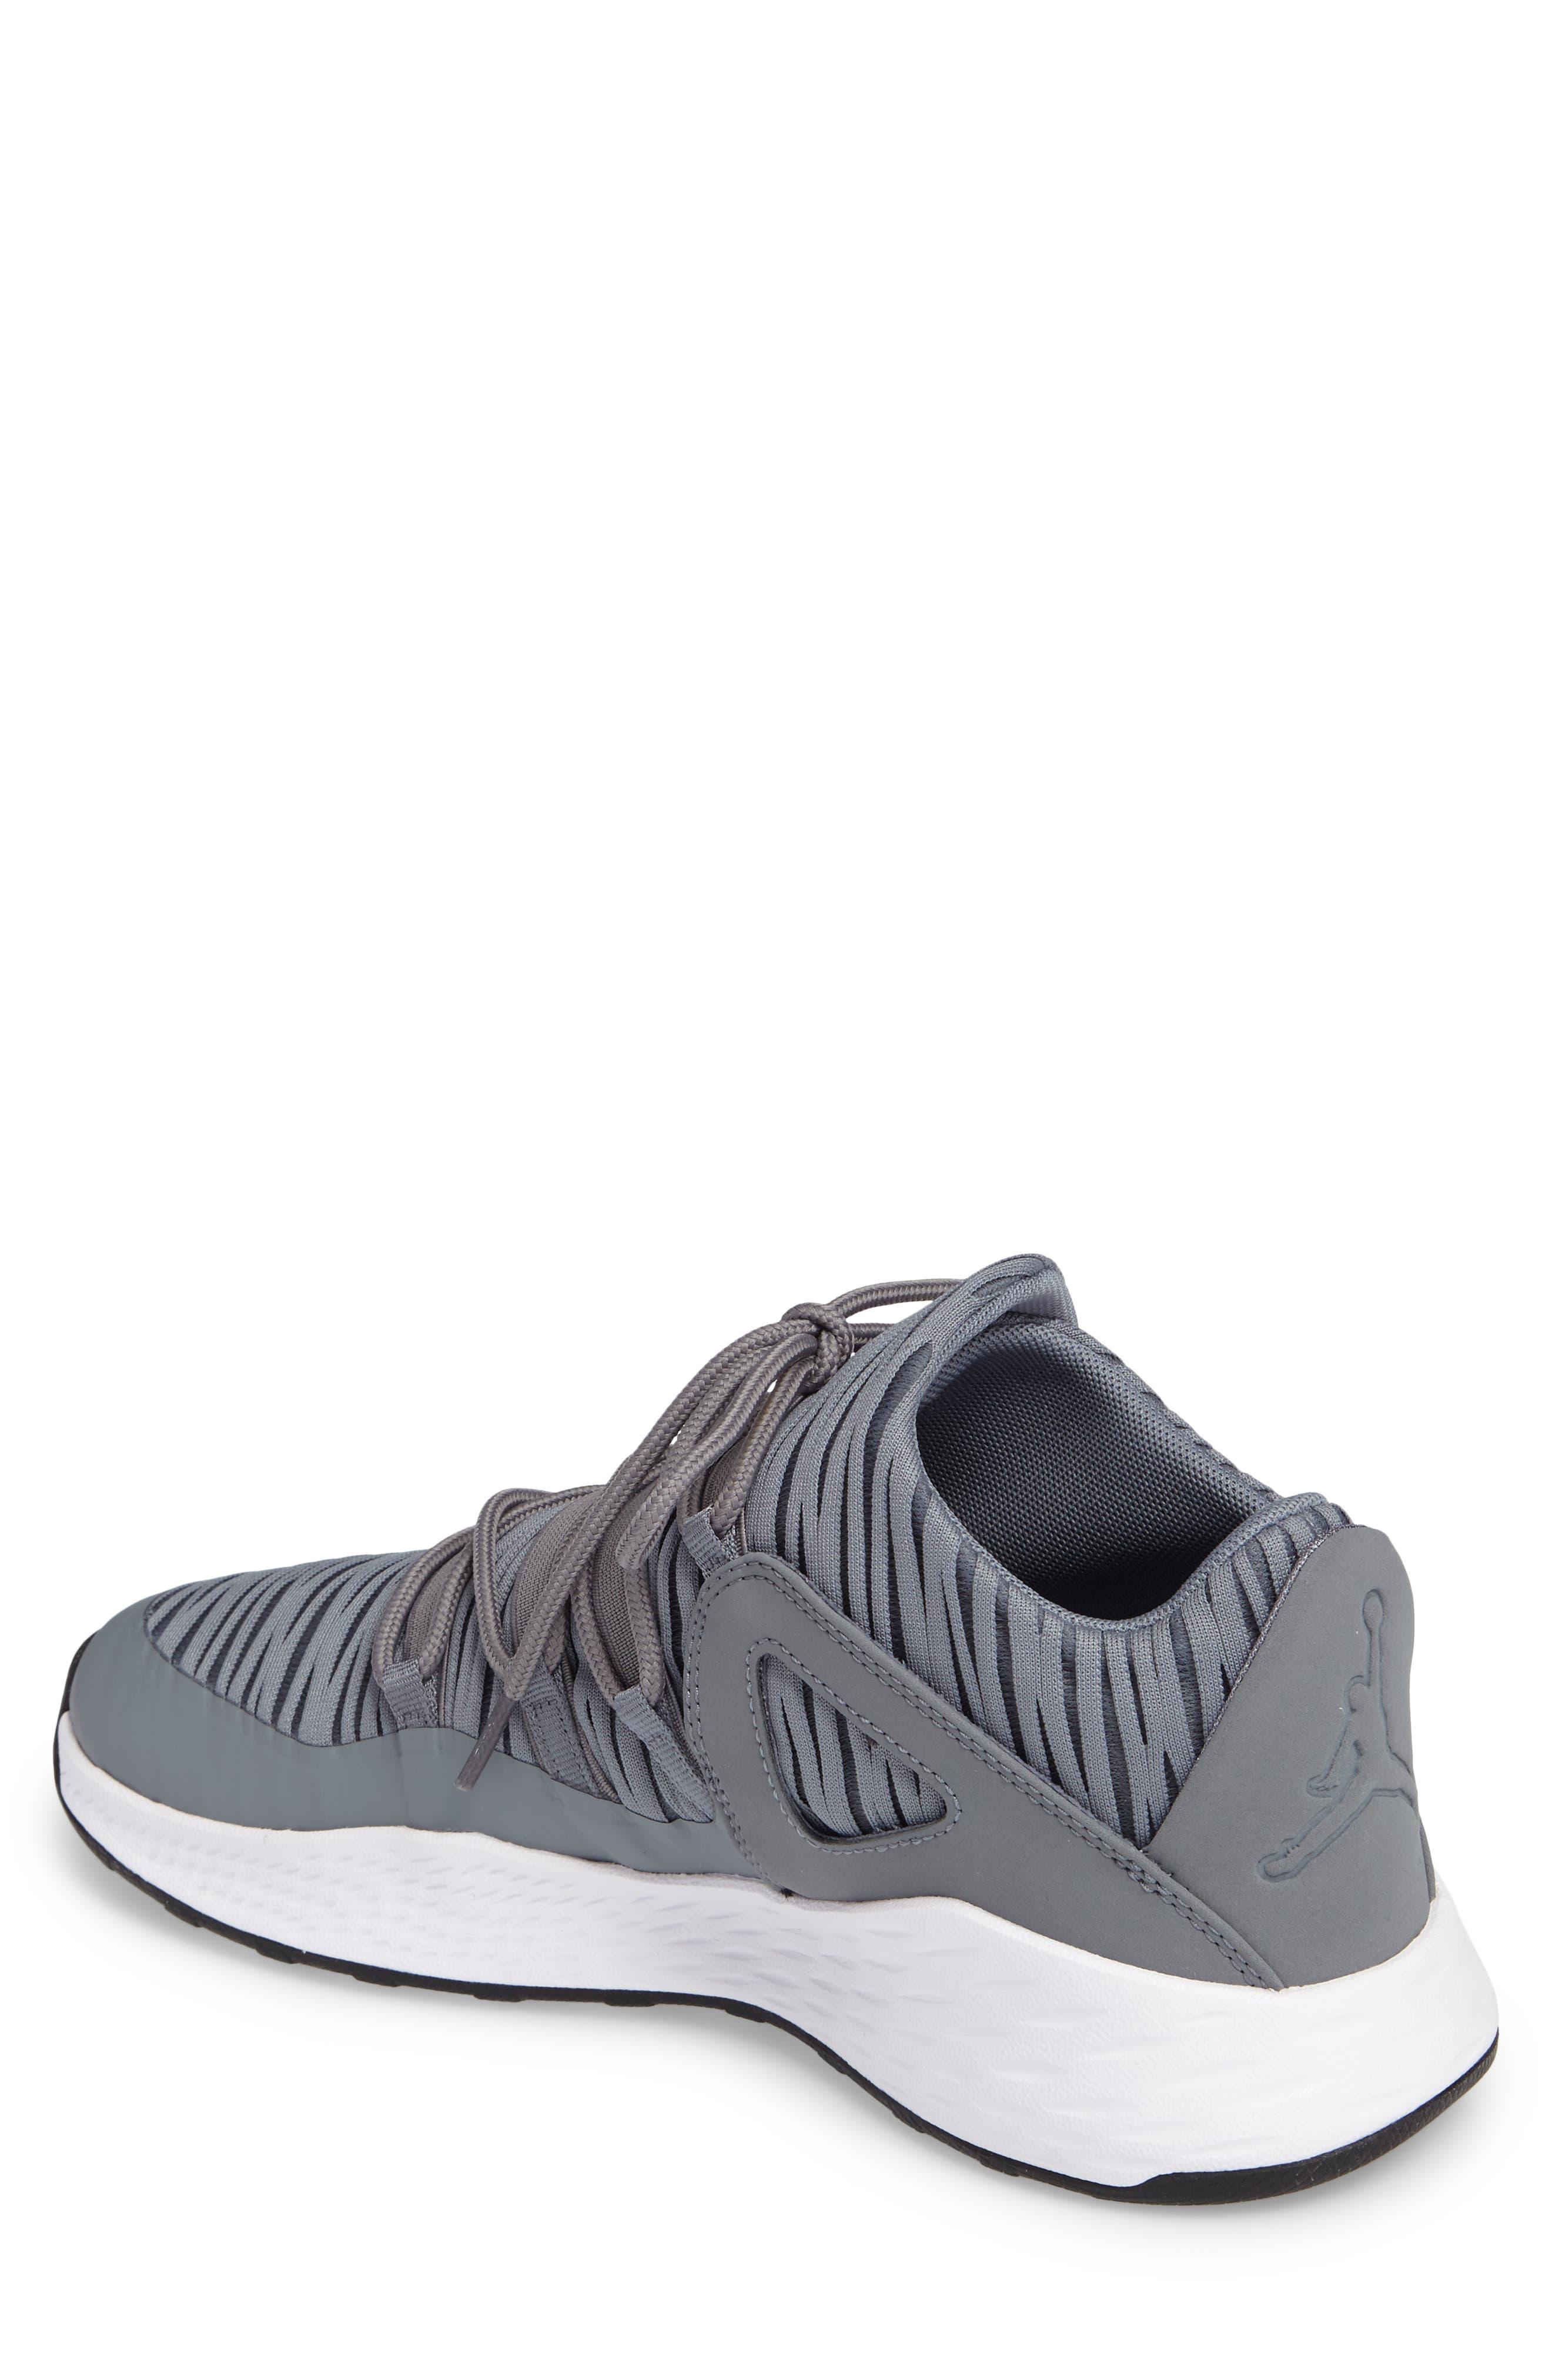 Jordan Formula 23 Low Sneaker,                             Alternate thumbnail 2, color,                             Cool Grey/ White/ Black